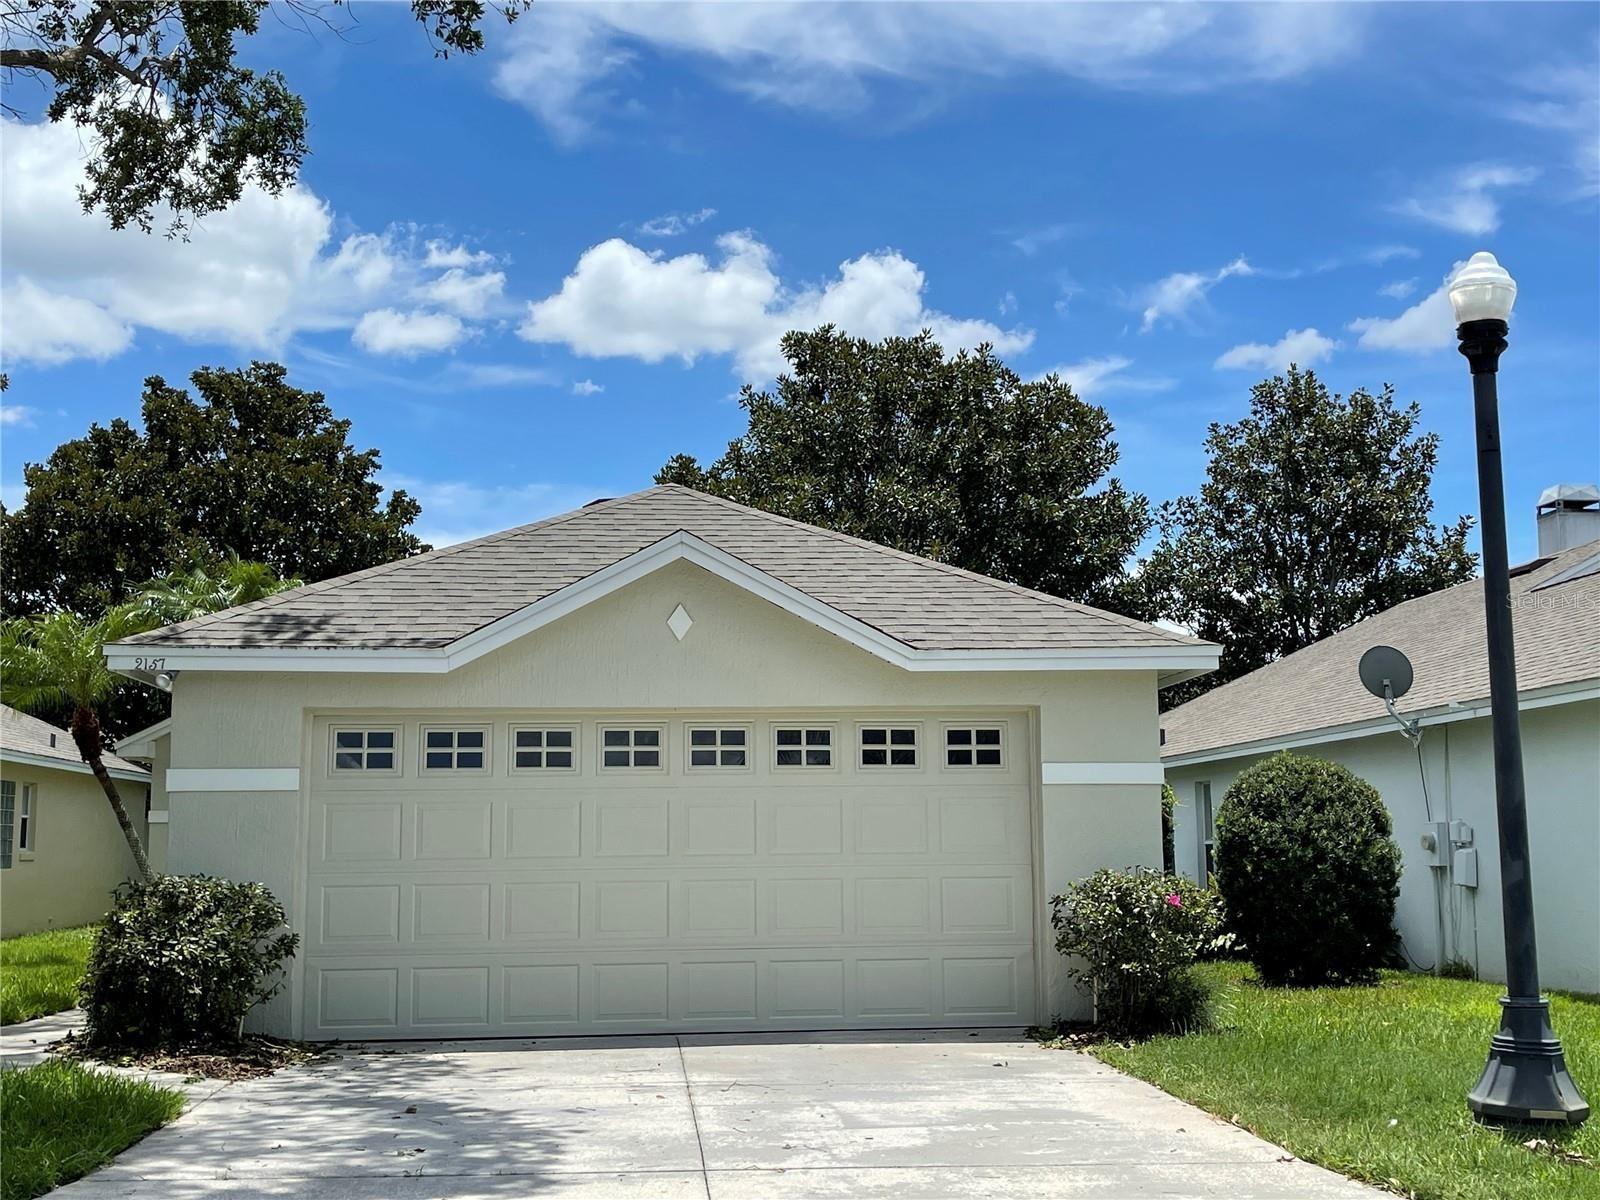 2157 STONEY POINTE DRIVE, Lakeland, FL 33813 - #: L4923730